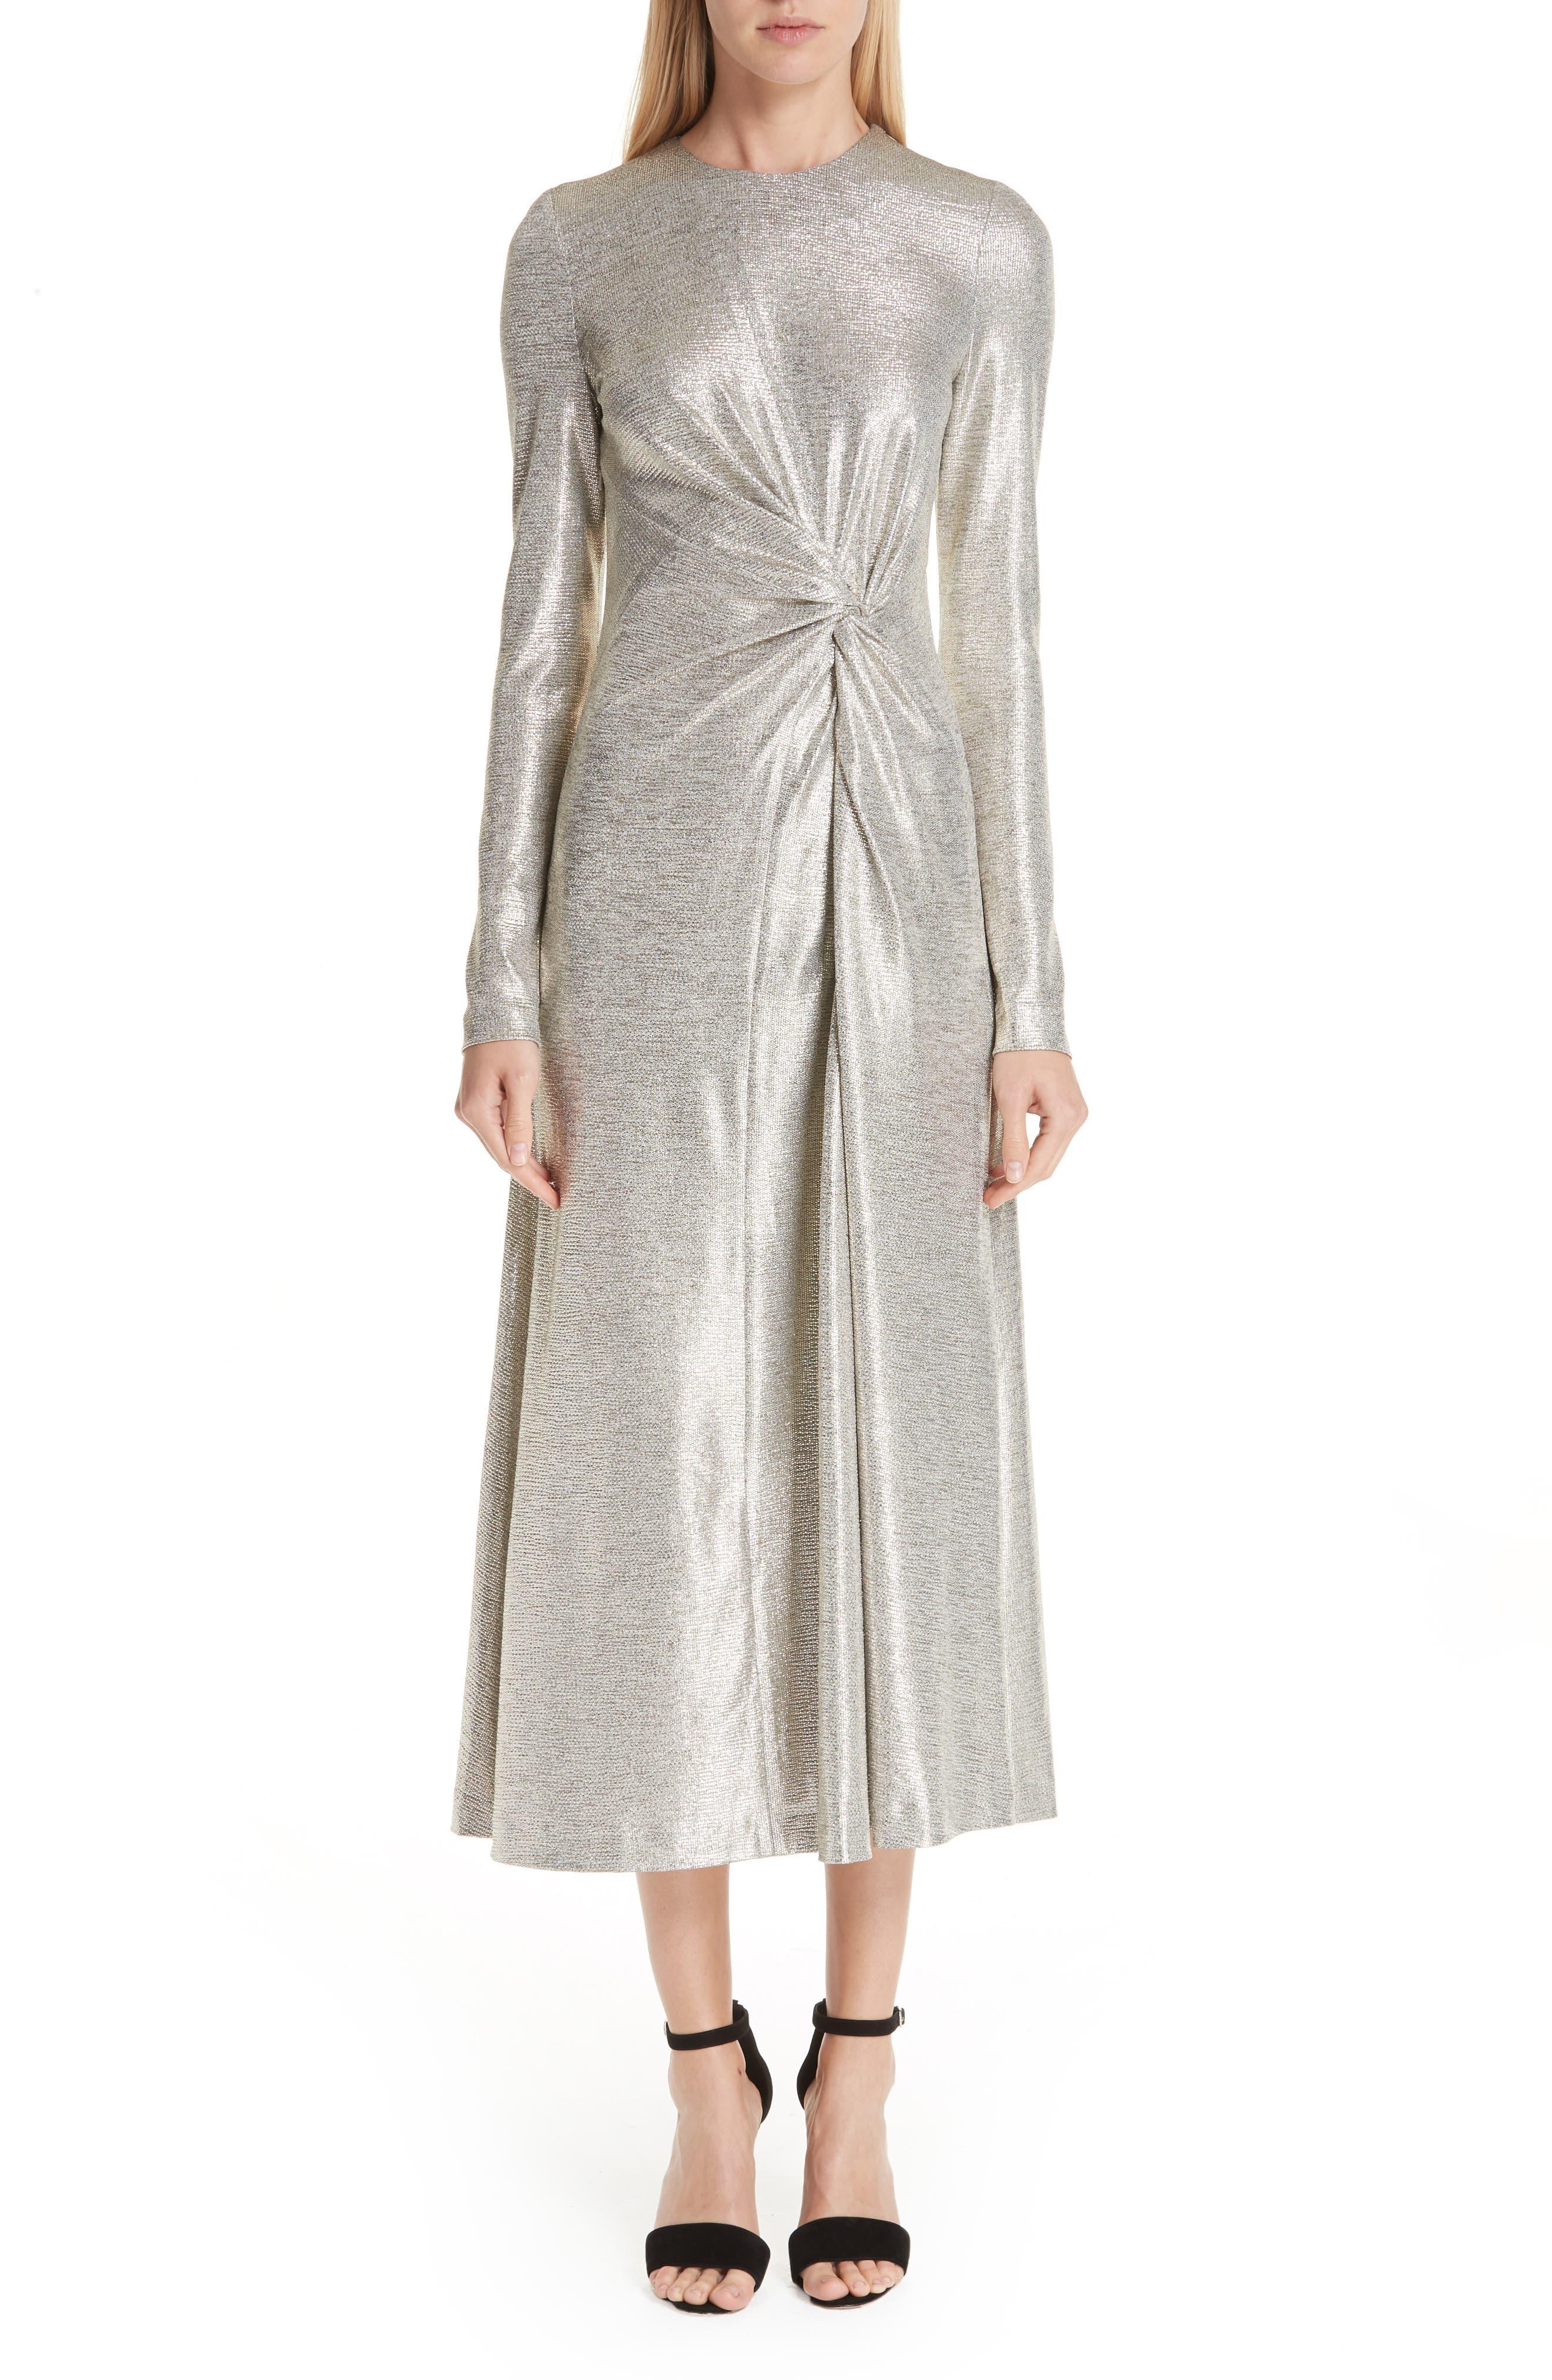 Twist Detail Metallic Dress,                             Main thumbnail 1, color,                             PLATINUM